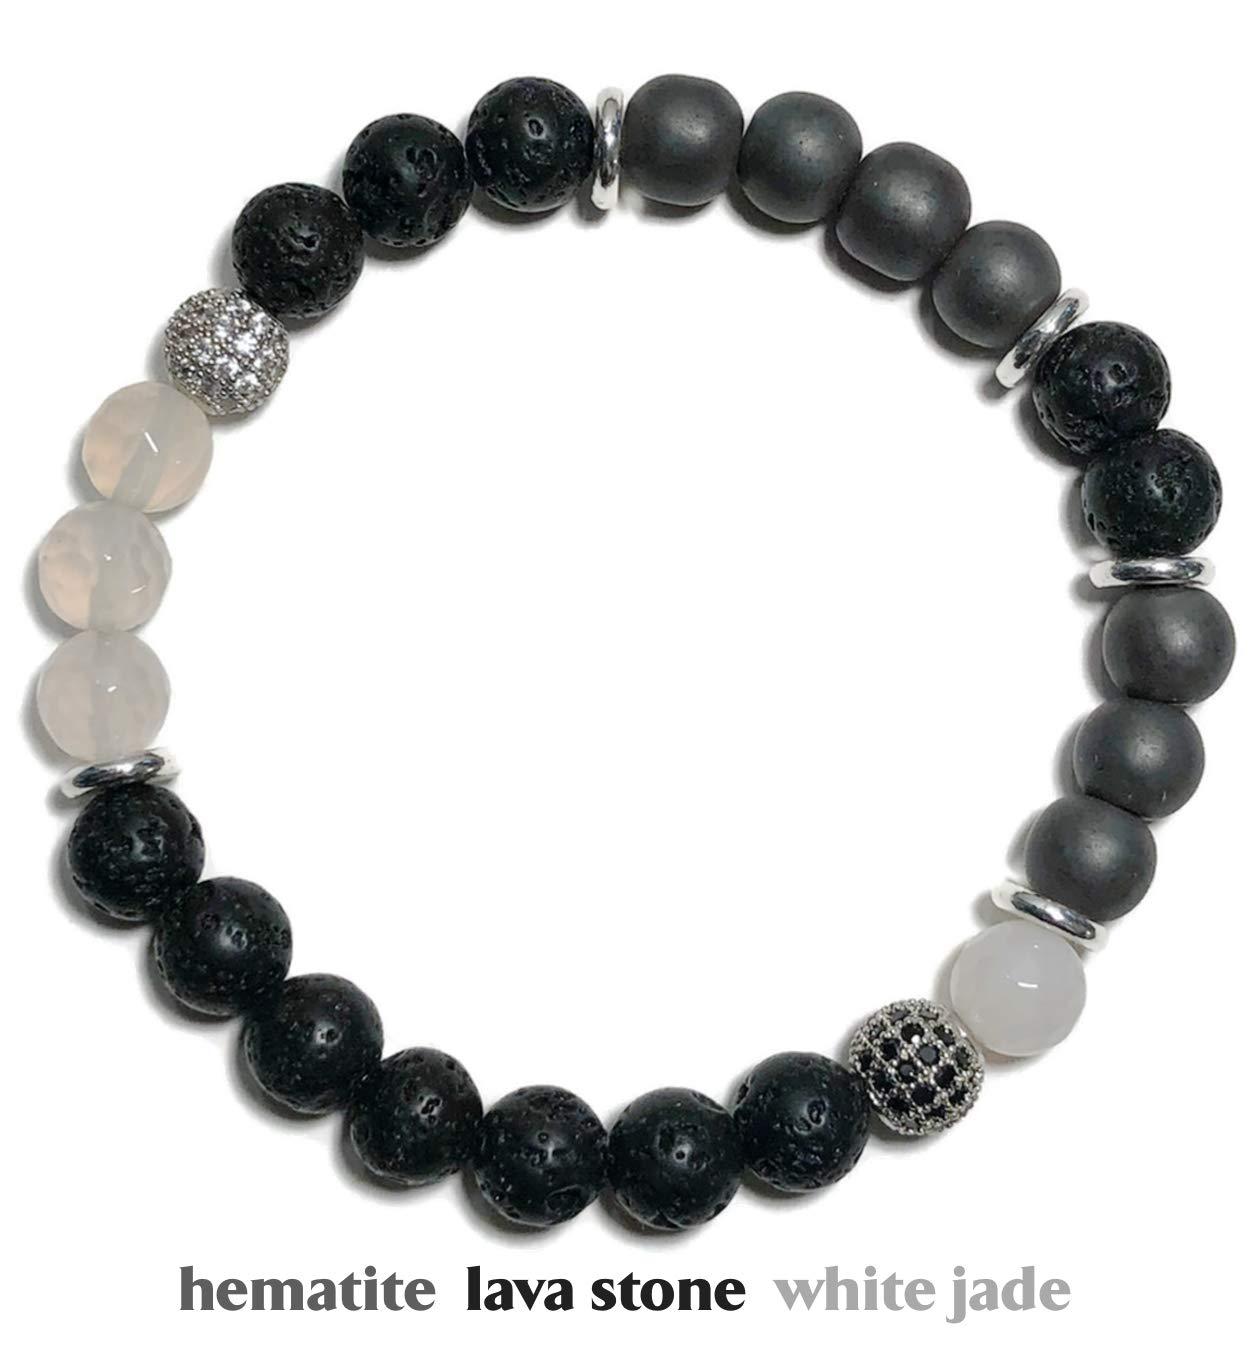 LOVE Bracelet, Natural Strawberry Quartz Charm Bracelet, Beaded Meditation Spiritual Stretch Mantra Reiki Healing Energy Boho Chakra Wrap Yoga Buddhist Jewelry & Gemstone Gifts | SOULMATE (7.5) by KarmaArm